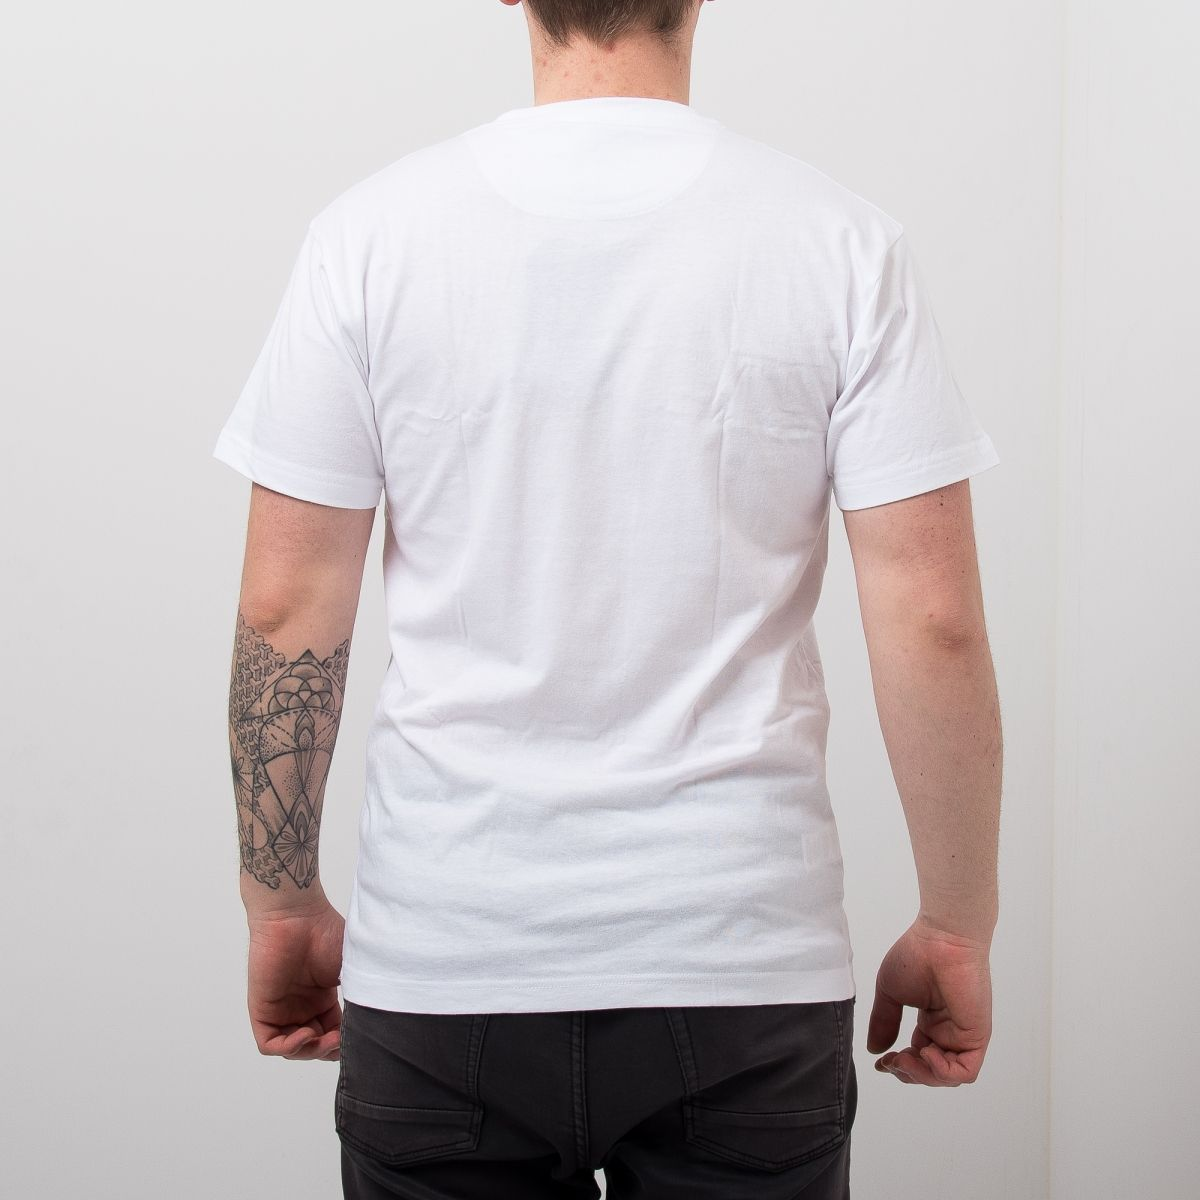 online retailer c5474 e2d59 Type Shirts Mitchell & Ness New Jersey Nets Drazen Petrovic & Derrick  Coleman Real Player Print Tee